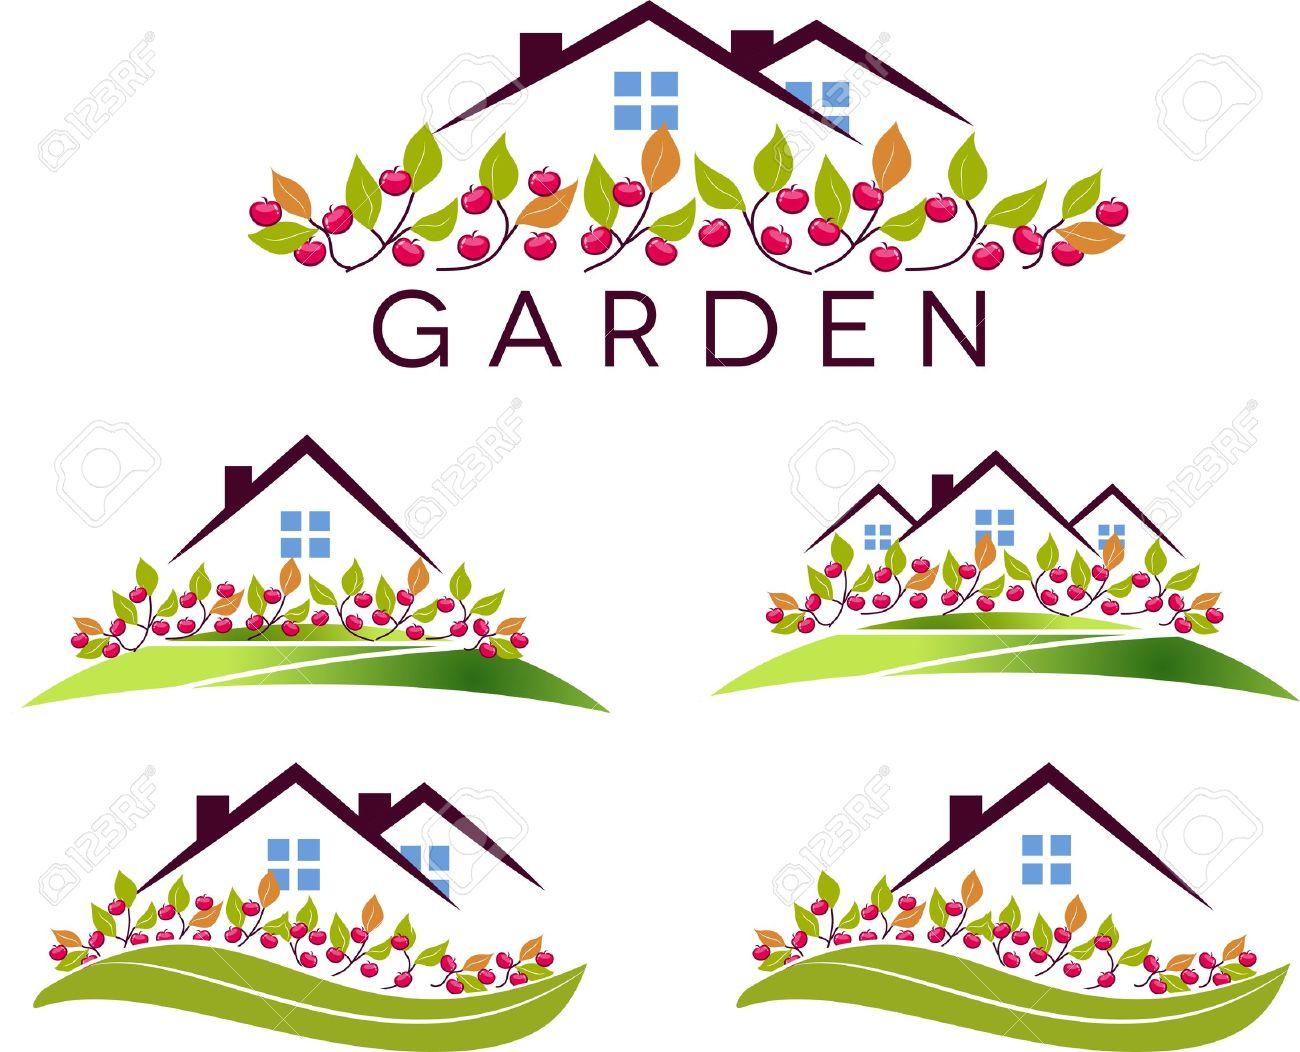 Haus und garten clipart freeuse stock Fruit Haus Und Garten Schöner Garten, Apfelbäume Und Rasen Auf ... freeuse stock